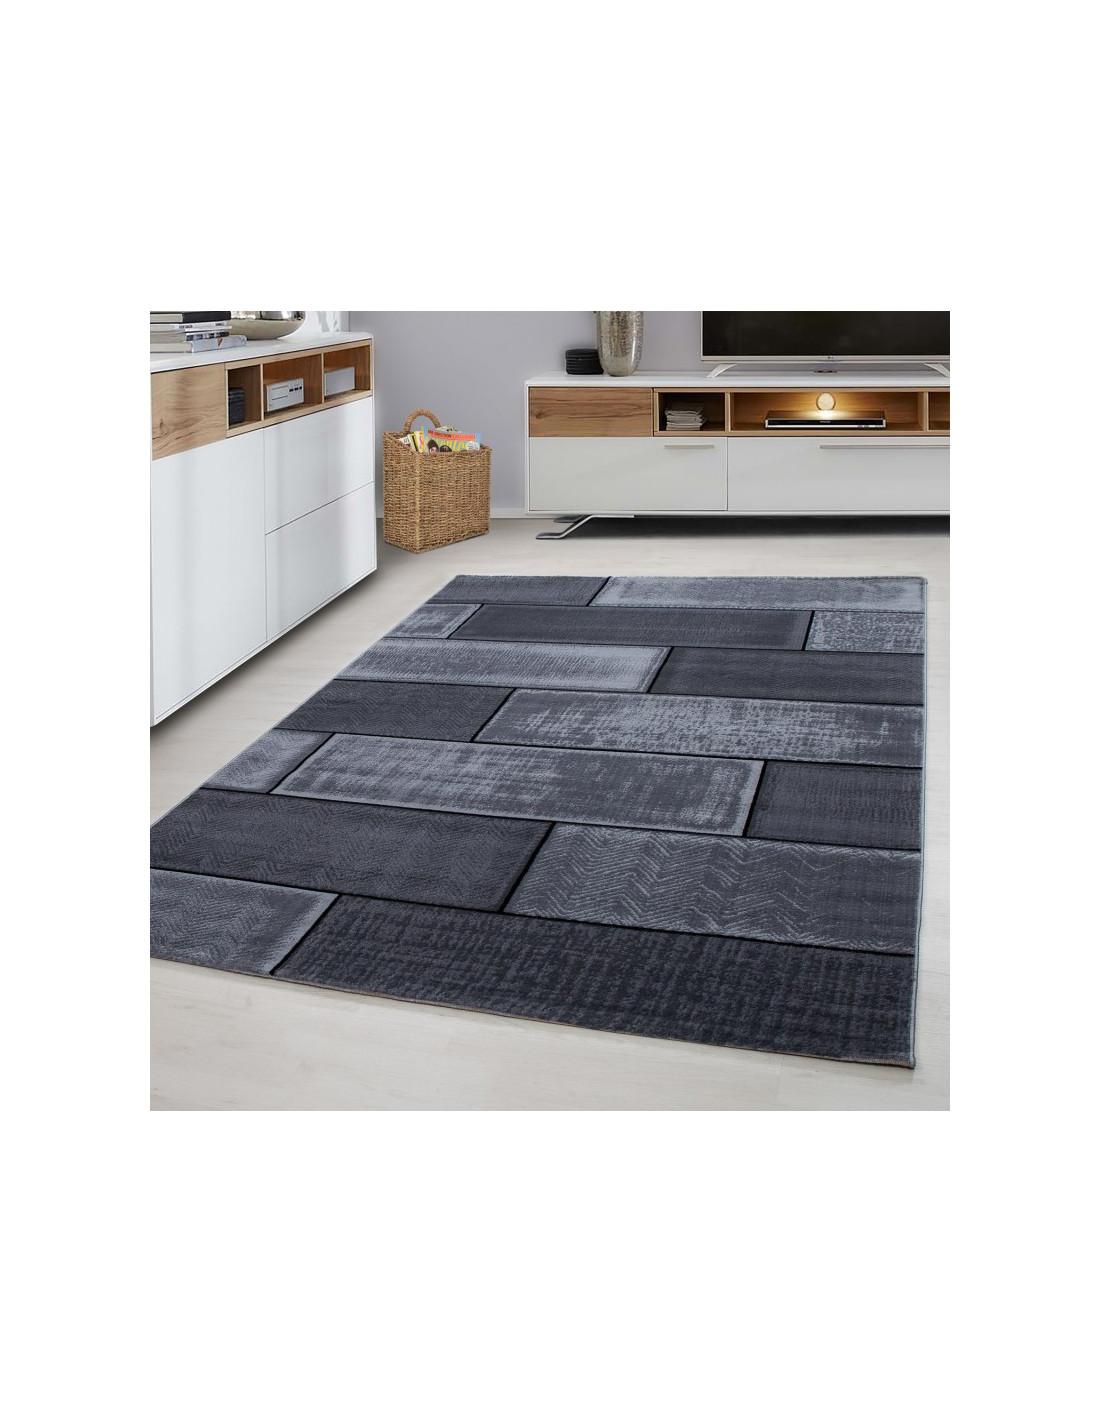 Designer living room youth room carpet wall motif checkered Plus 8007 Black